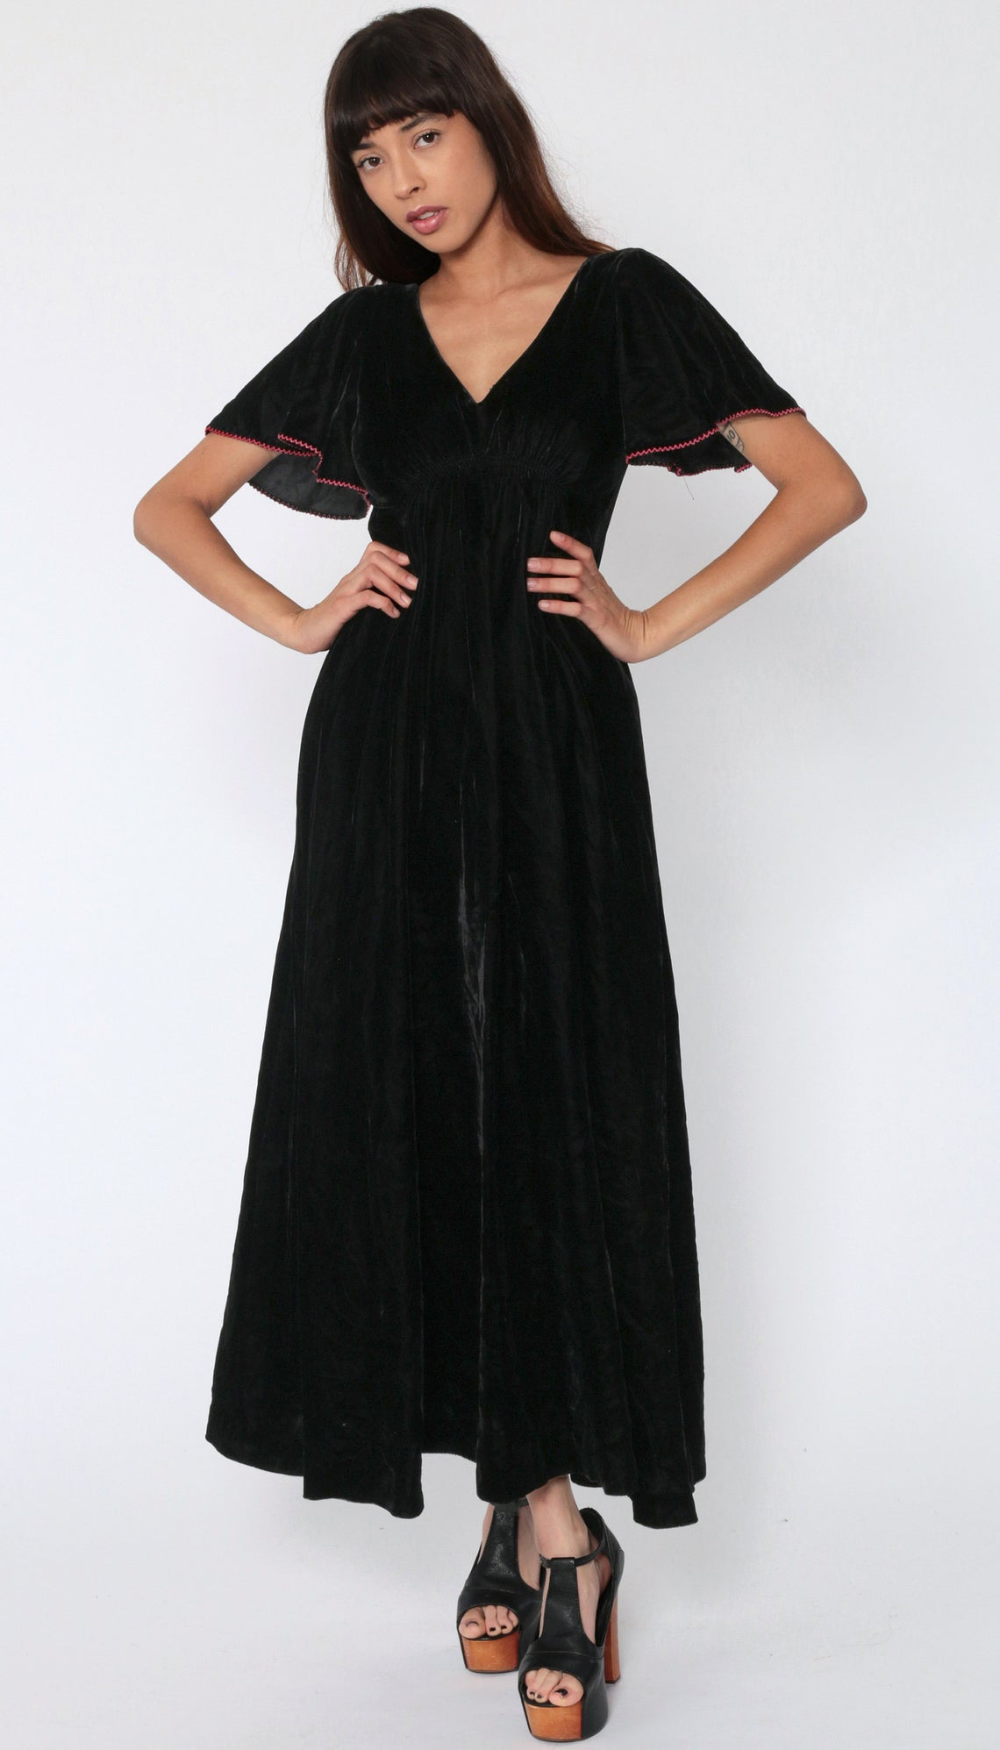 Black Velvet Dress 70s Maxi Flutter Sleeve Party Formal Prom Etsy 70s Dress Black Velvet Dress 70s Inspired Fashion [ 1750 x 1000 Pixel ]